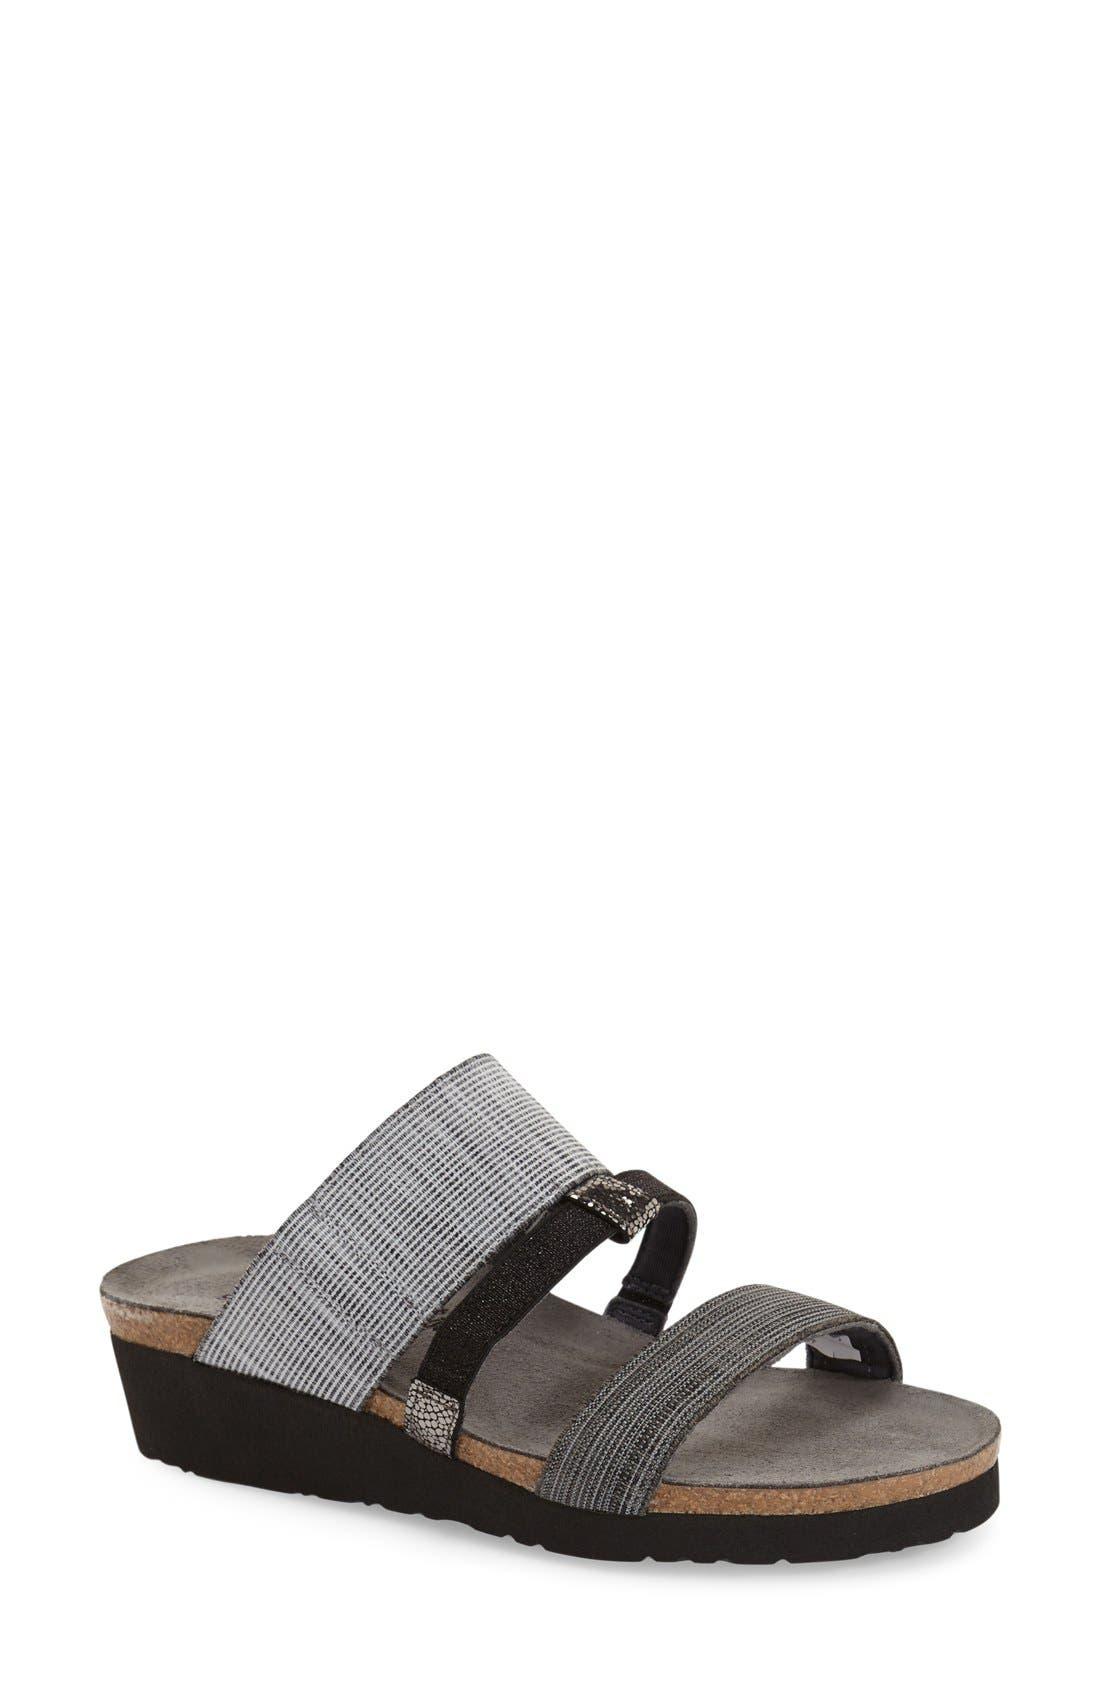 'Brenda' Slip-On Sandal,                             Main thumbnail 1, color,                             Grey/ Black Leather Fabric